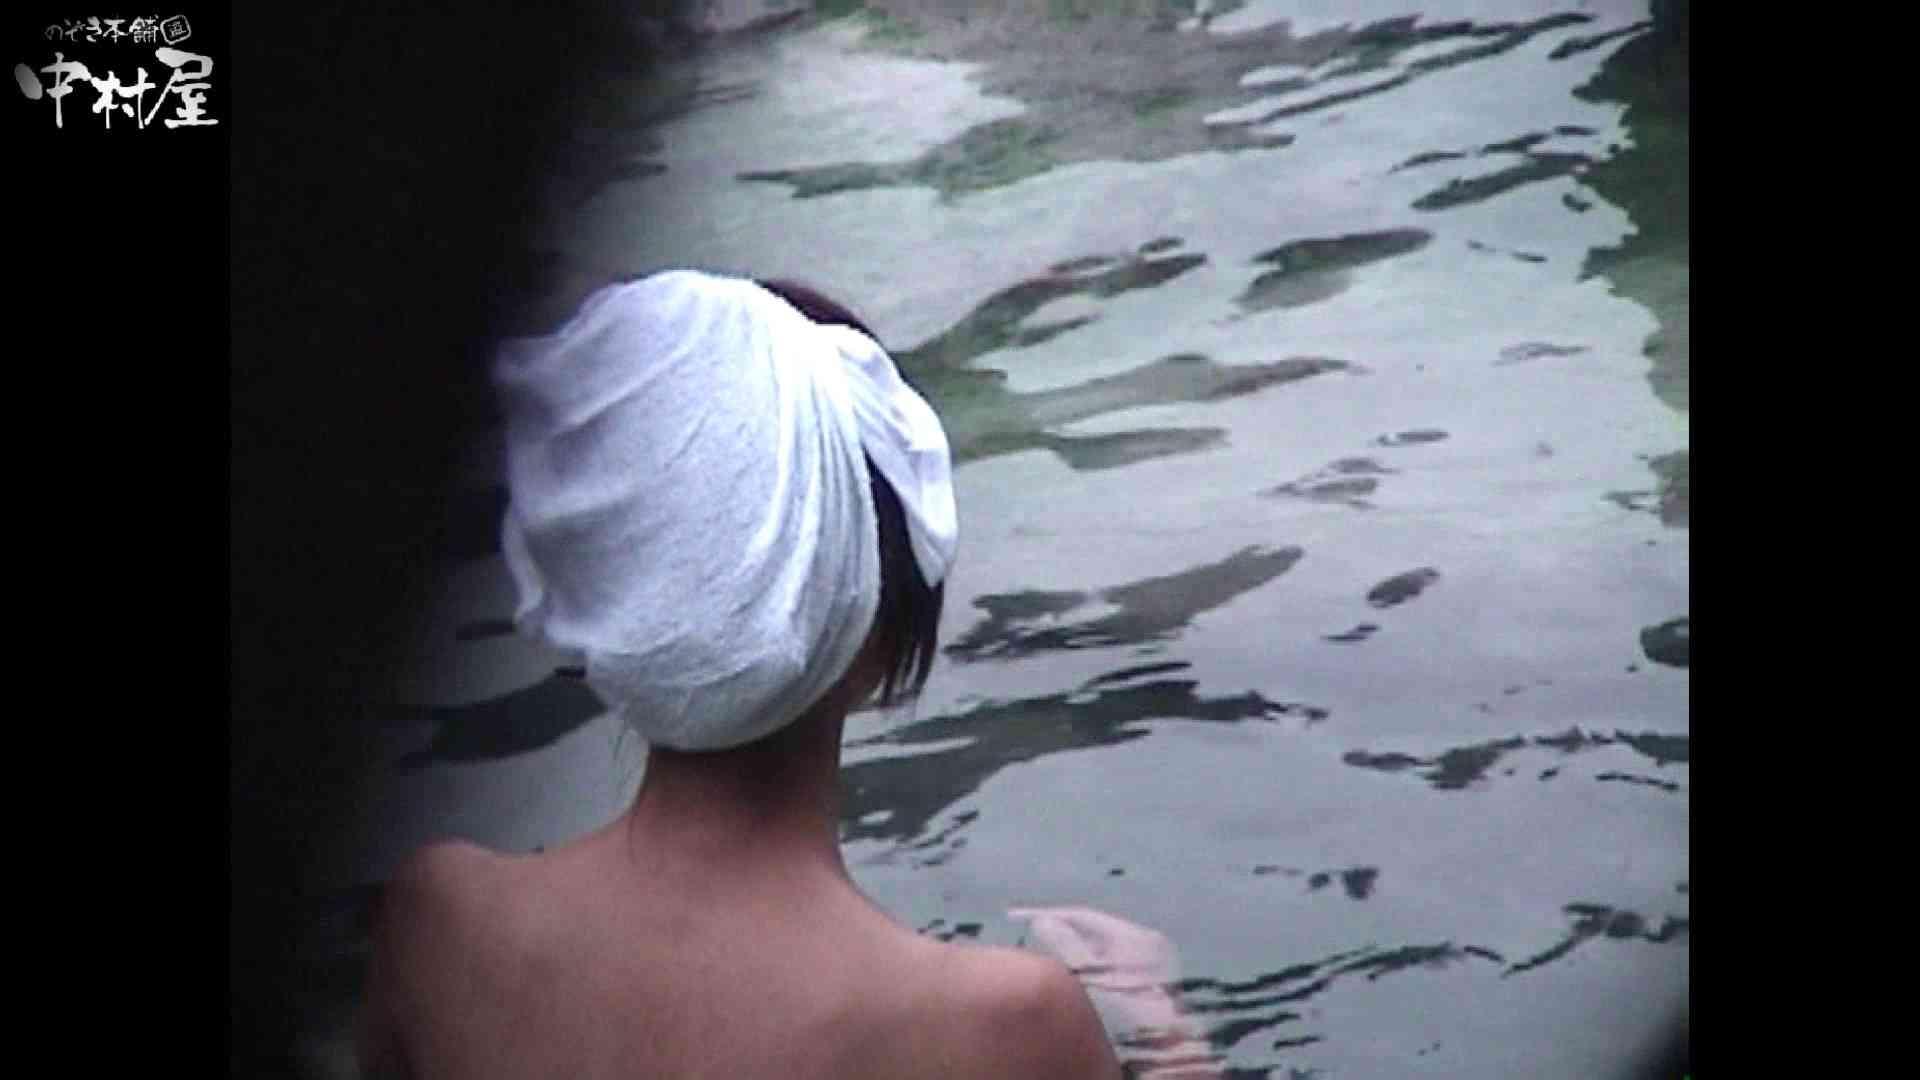 Aquaな露天風呂Vol.952 盗撮師作品  74pic 48